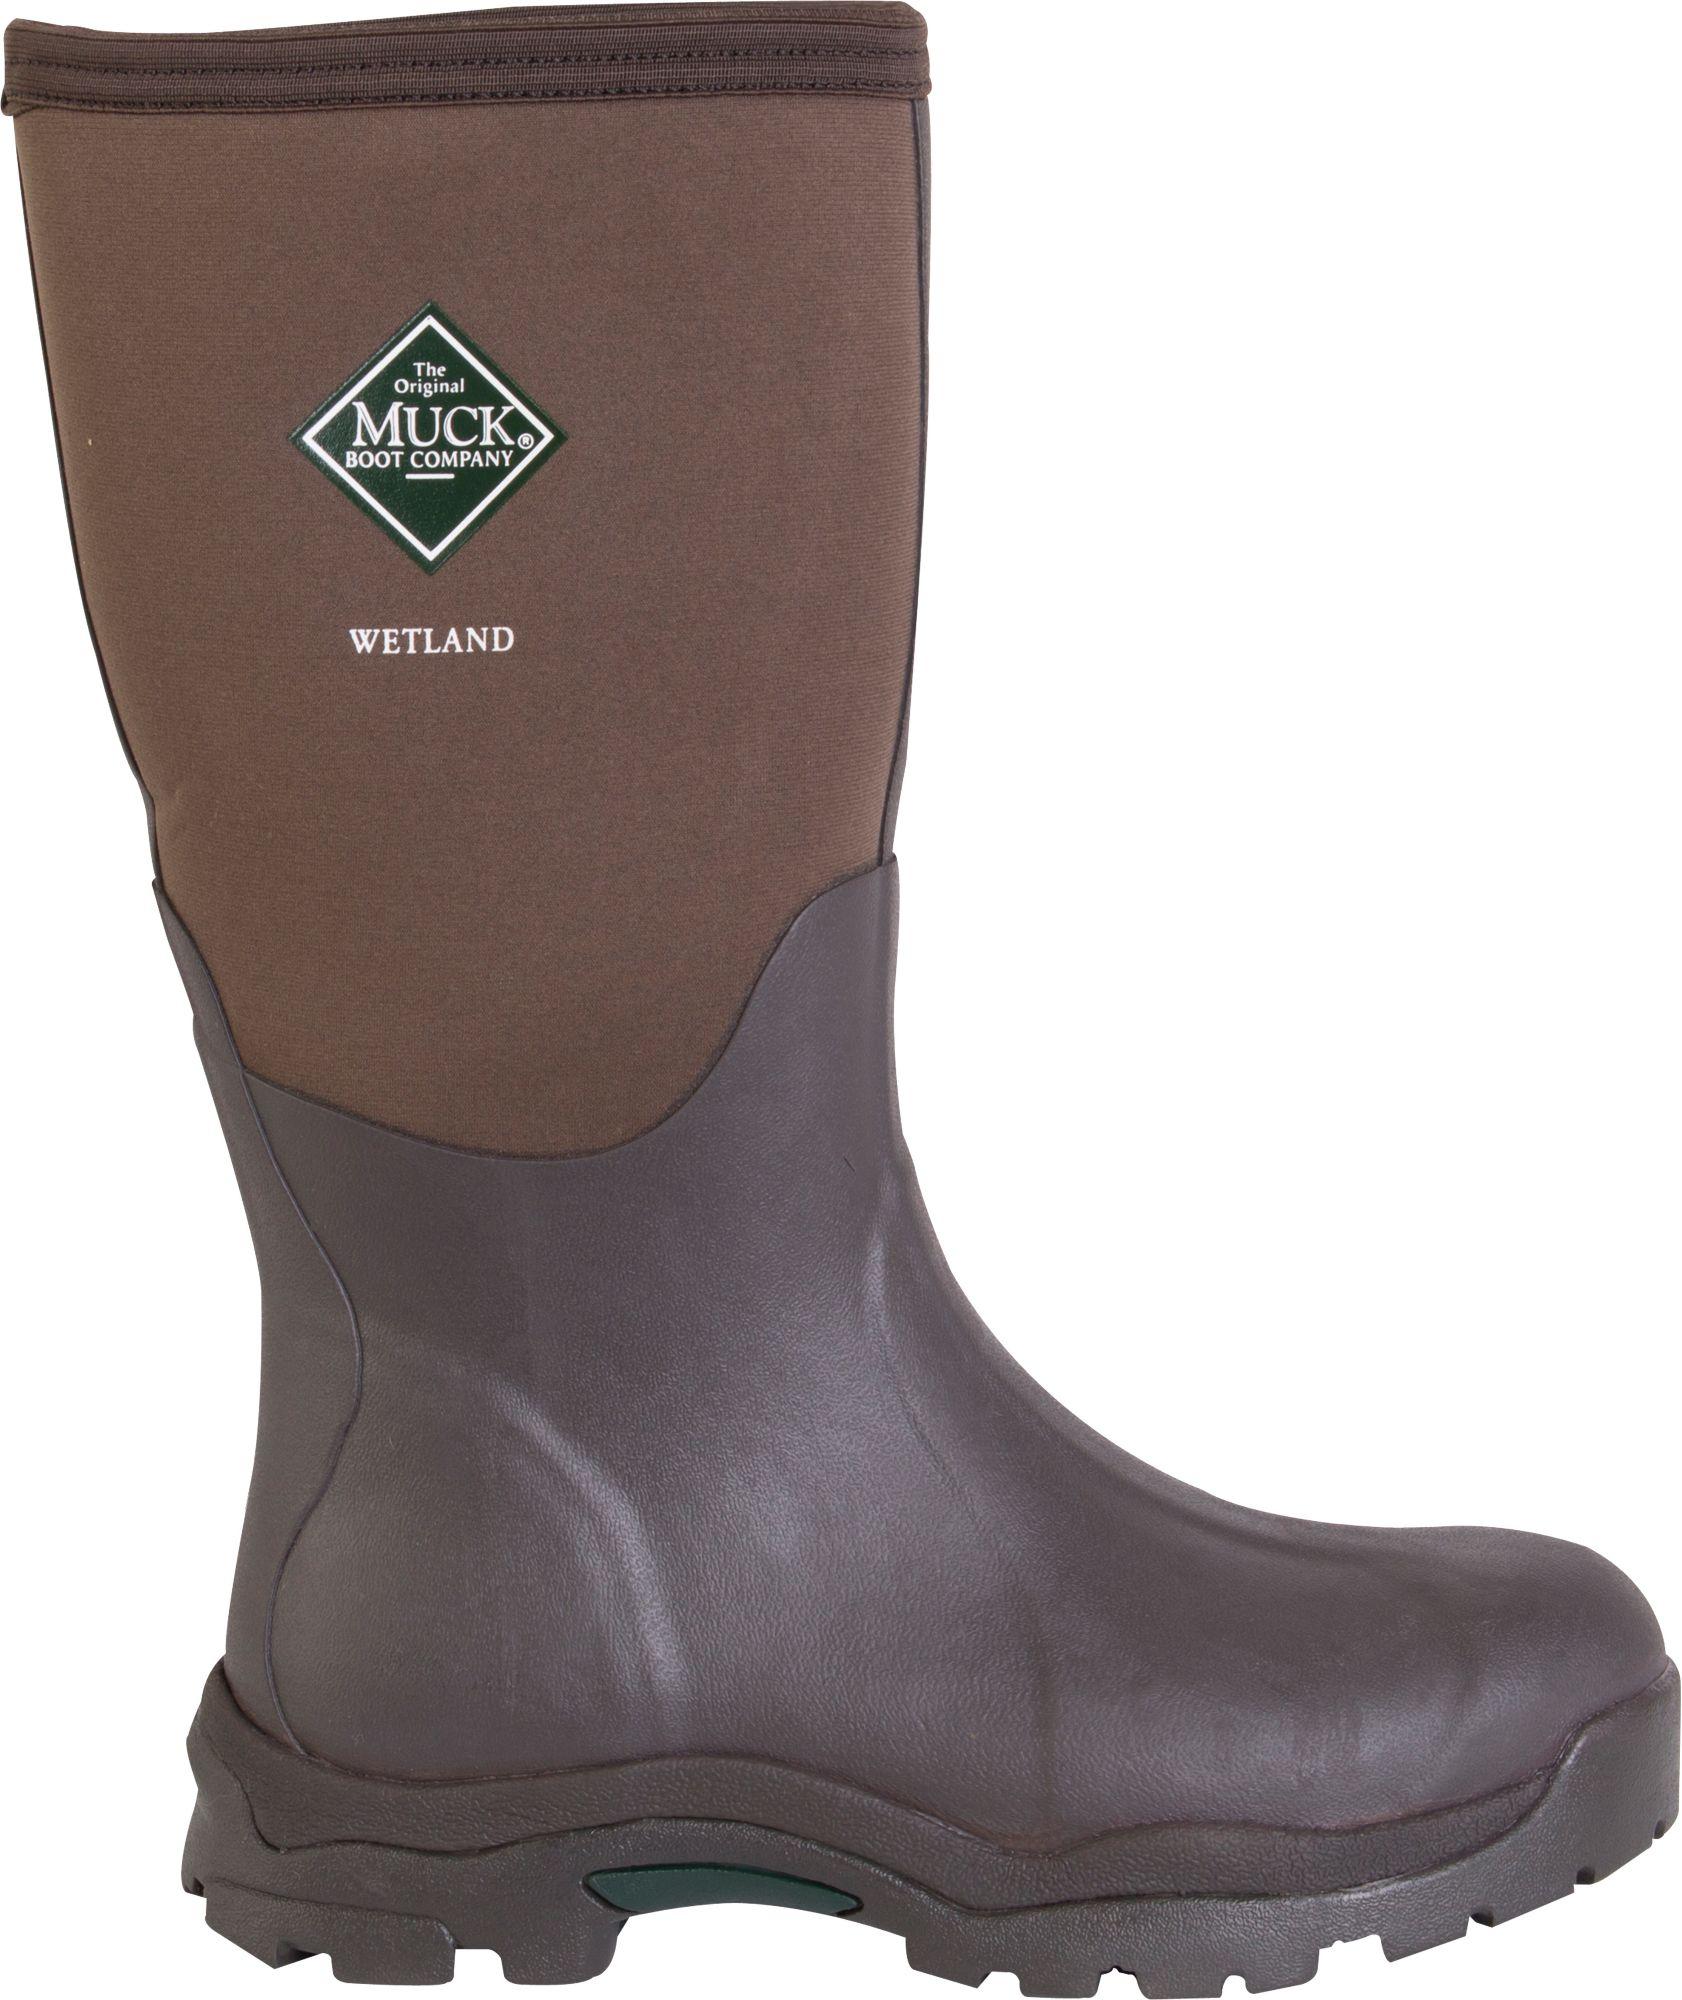 Muck Boots Women's Wetland Premium Field Boots | Field & Stream